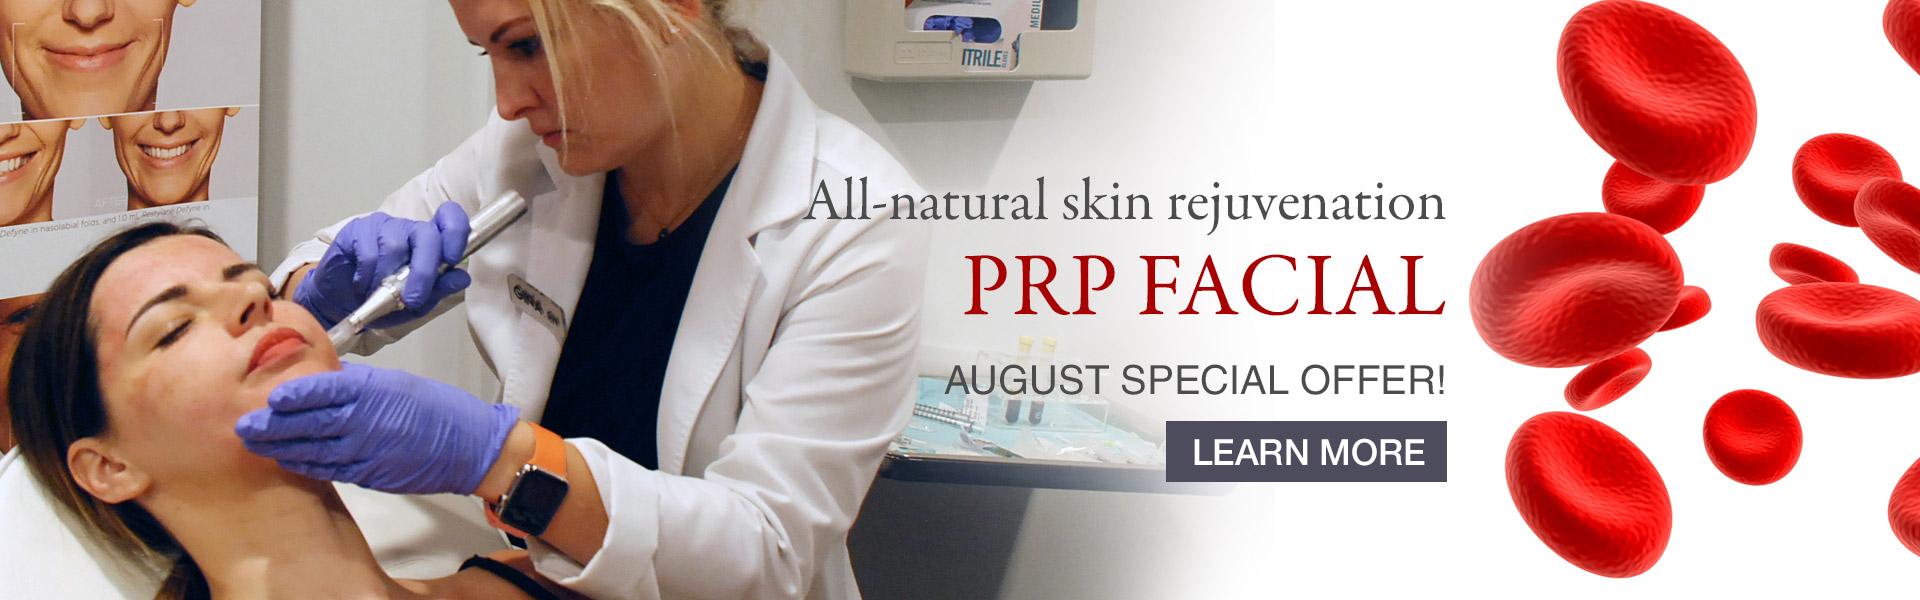 mspa_prp-facial-slider_07-24-2018-1